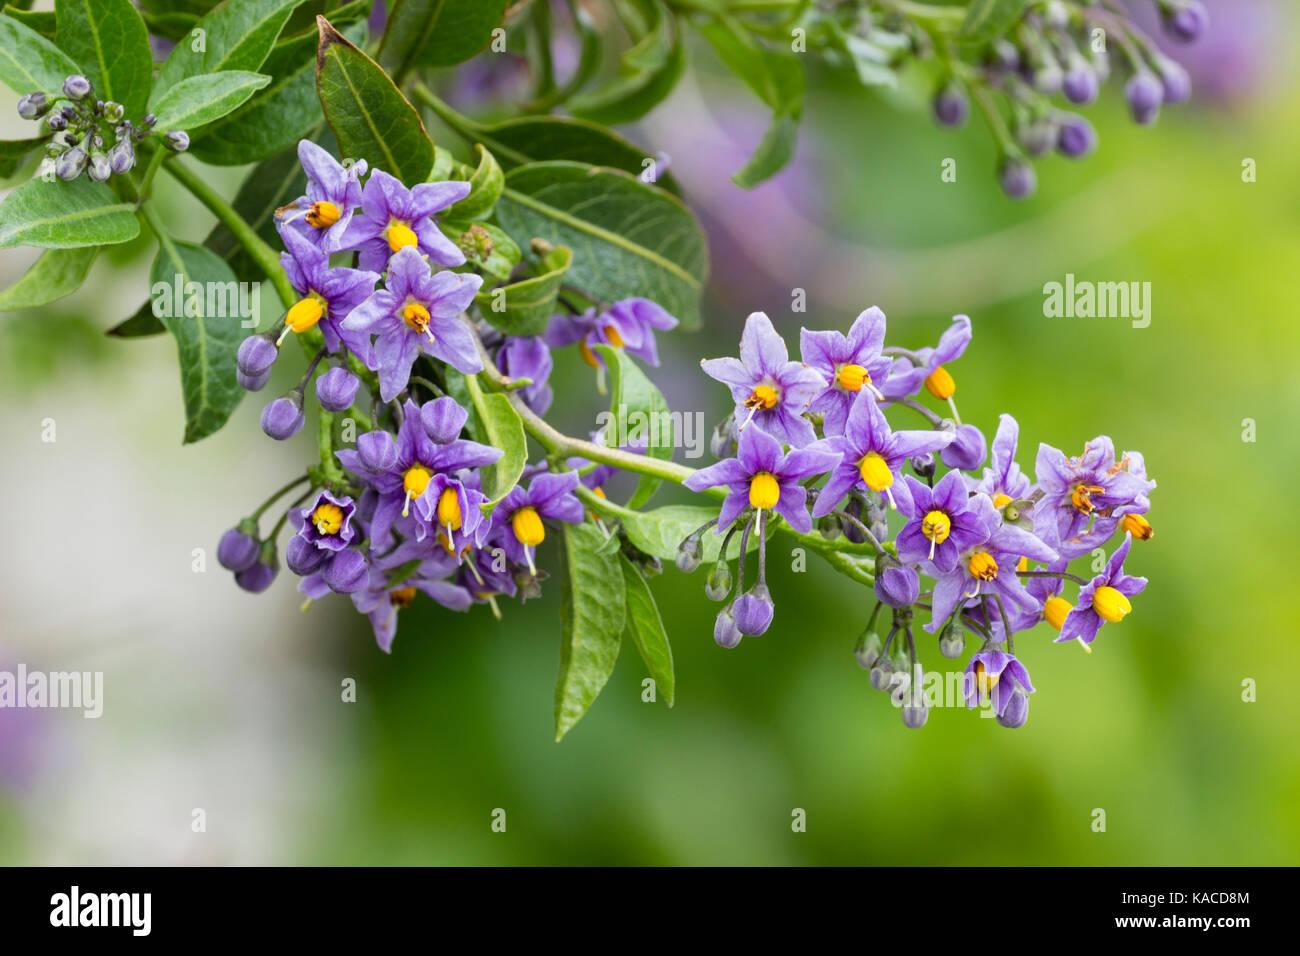 Purple Flowers Of The Climbing Potato Vine Solanum Crispum Stock